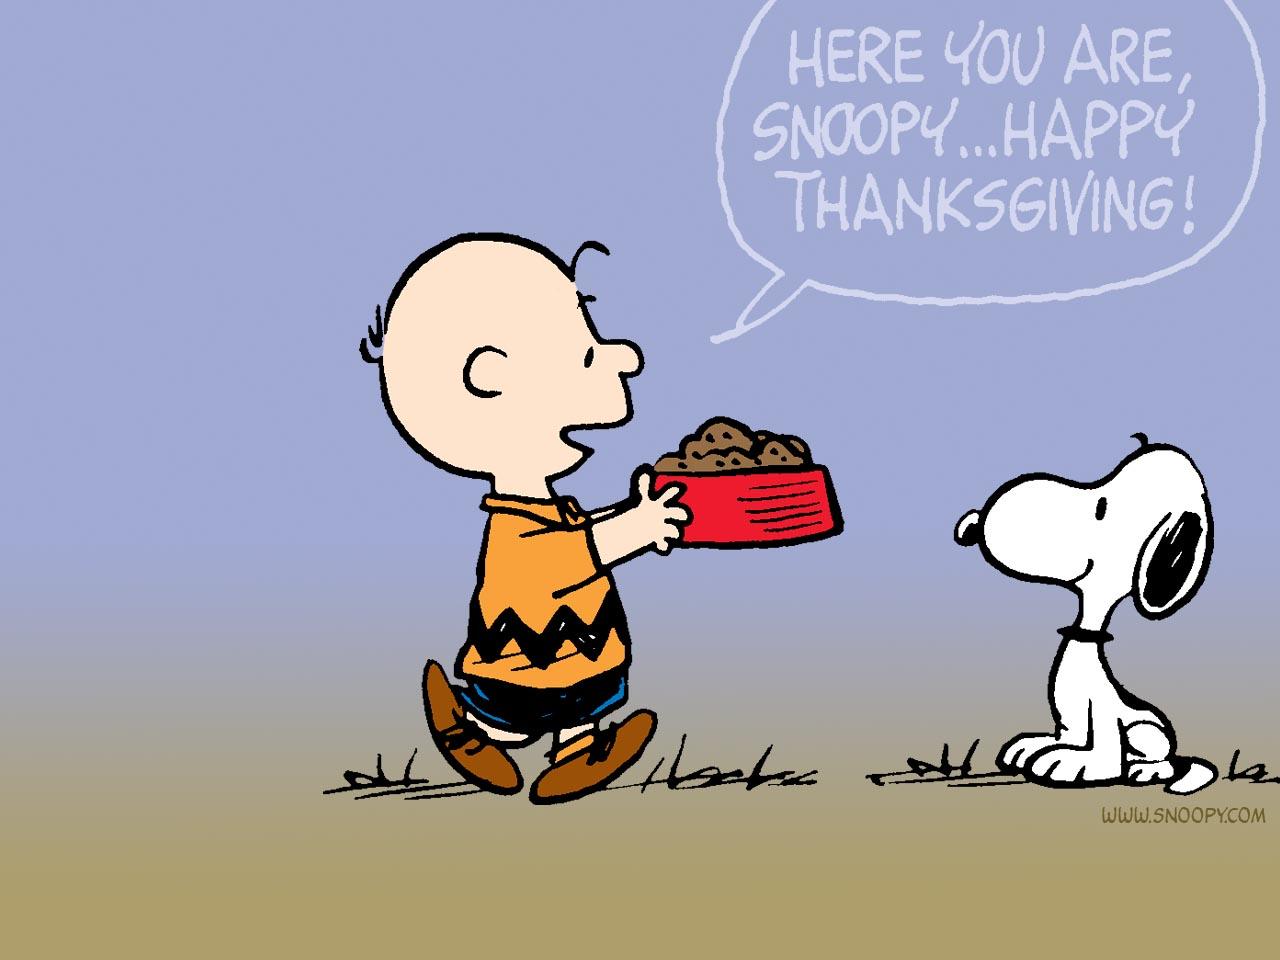 Cartoon Thanksgiving Wallpapers | 9st Street - Holiday ...